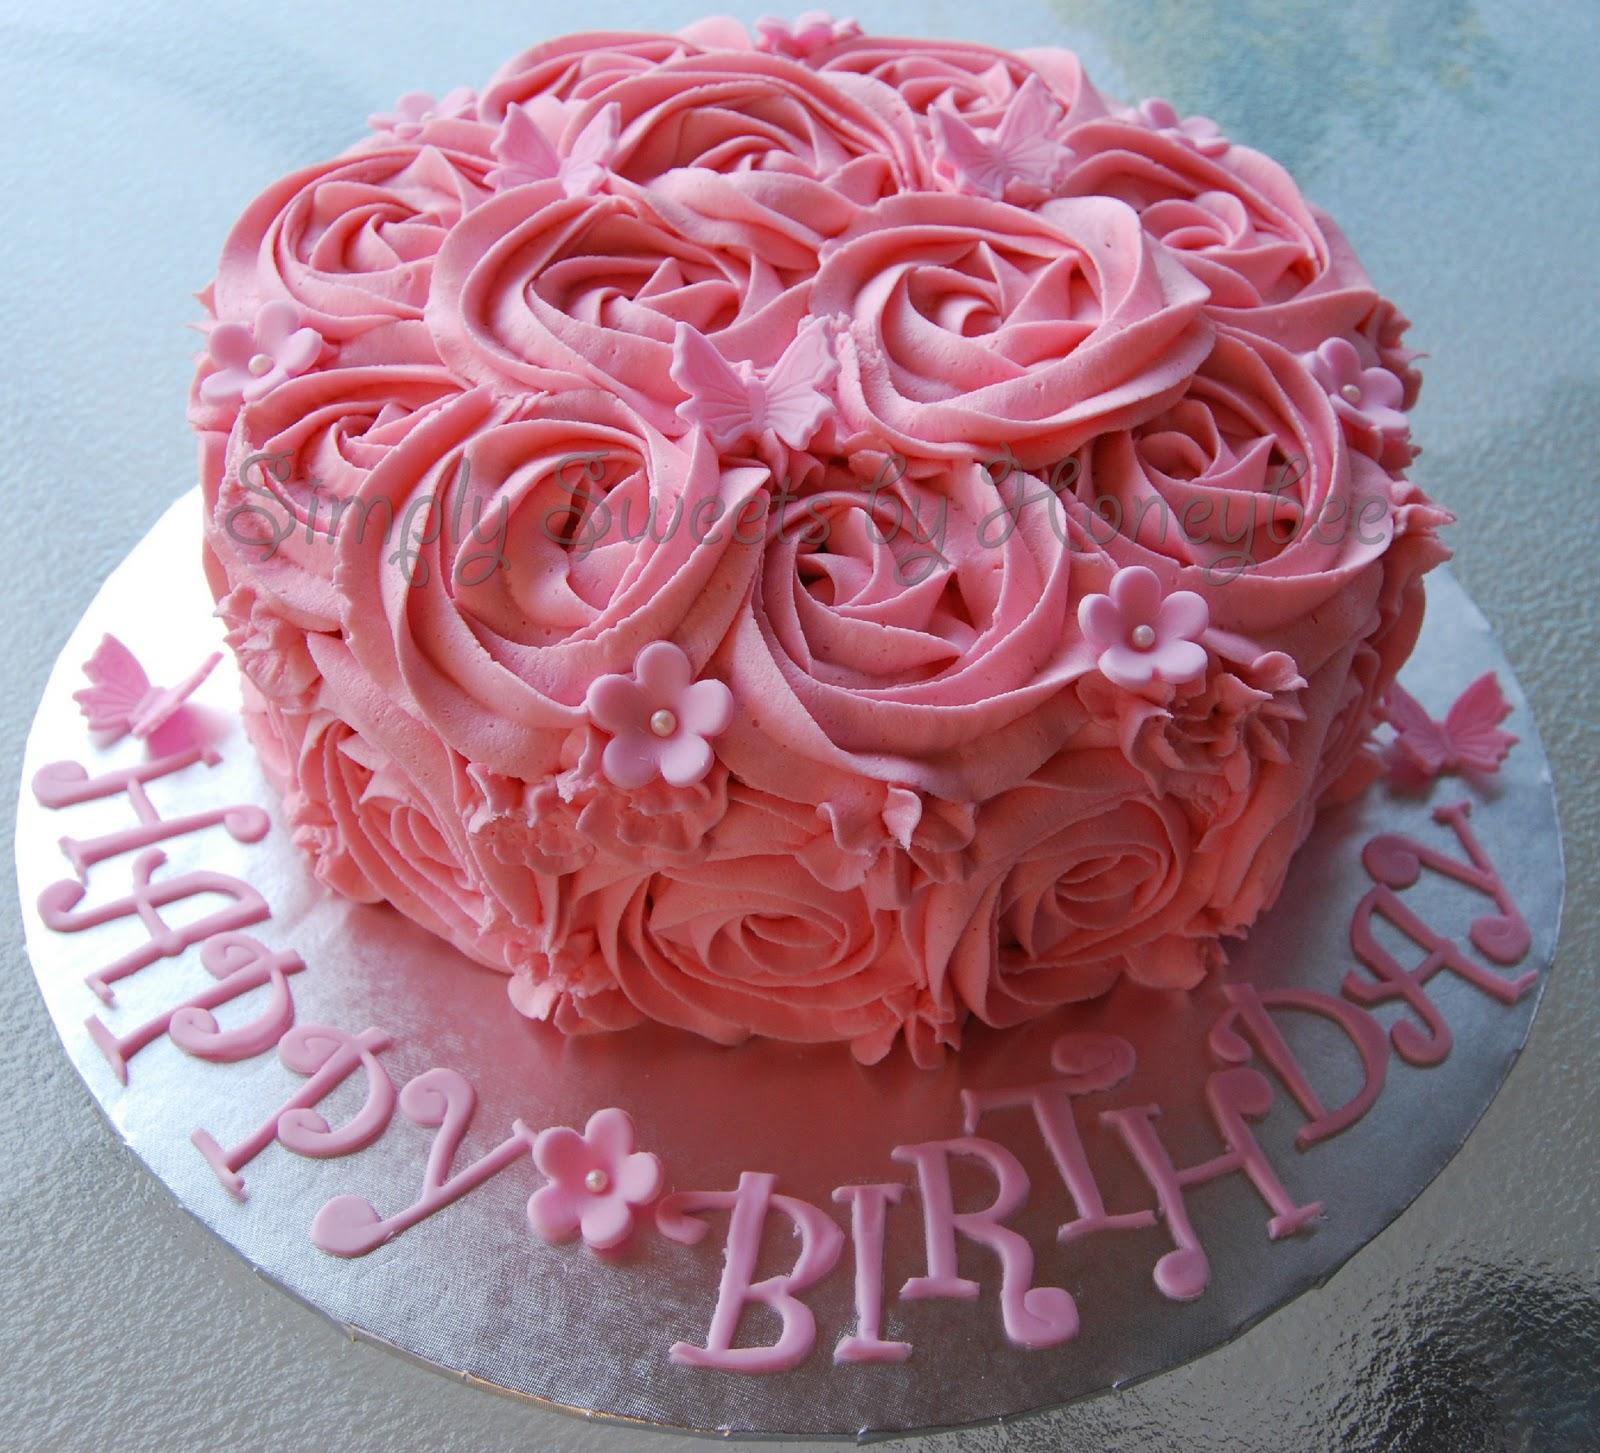 Two Birthday Cakes Simplysweetsbyhoneybee Com